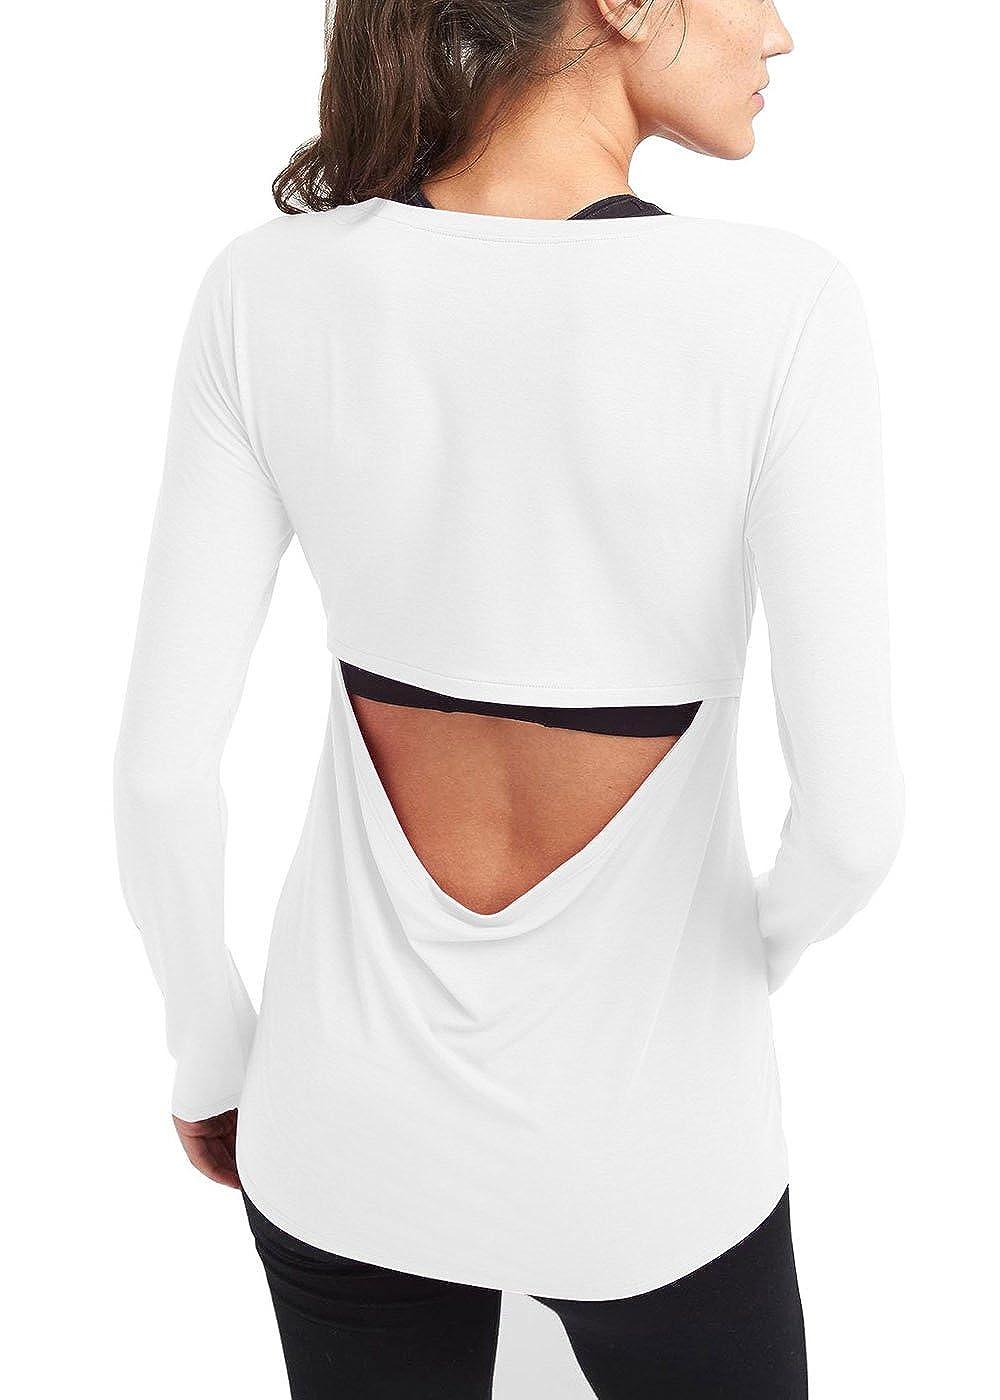 04b6cbbb87470a Bestisun Women s Long Sleeve Yoga Tank Top Open Back Workout Sport ...